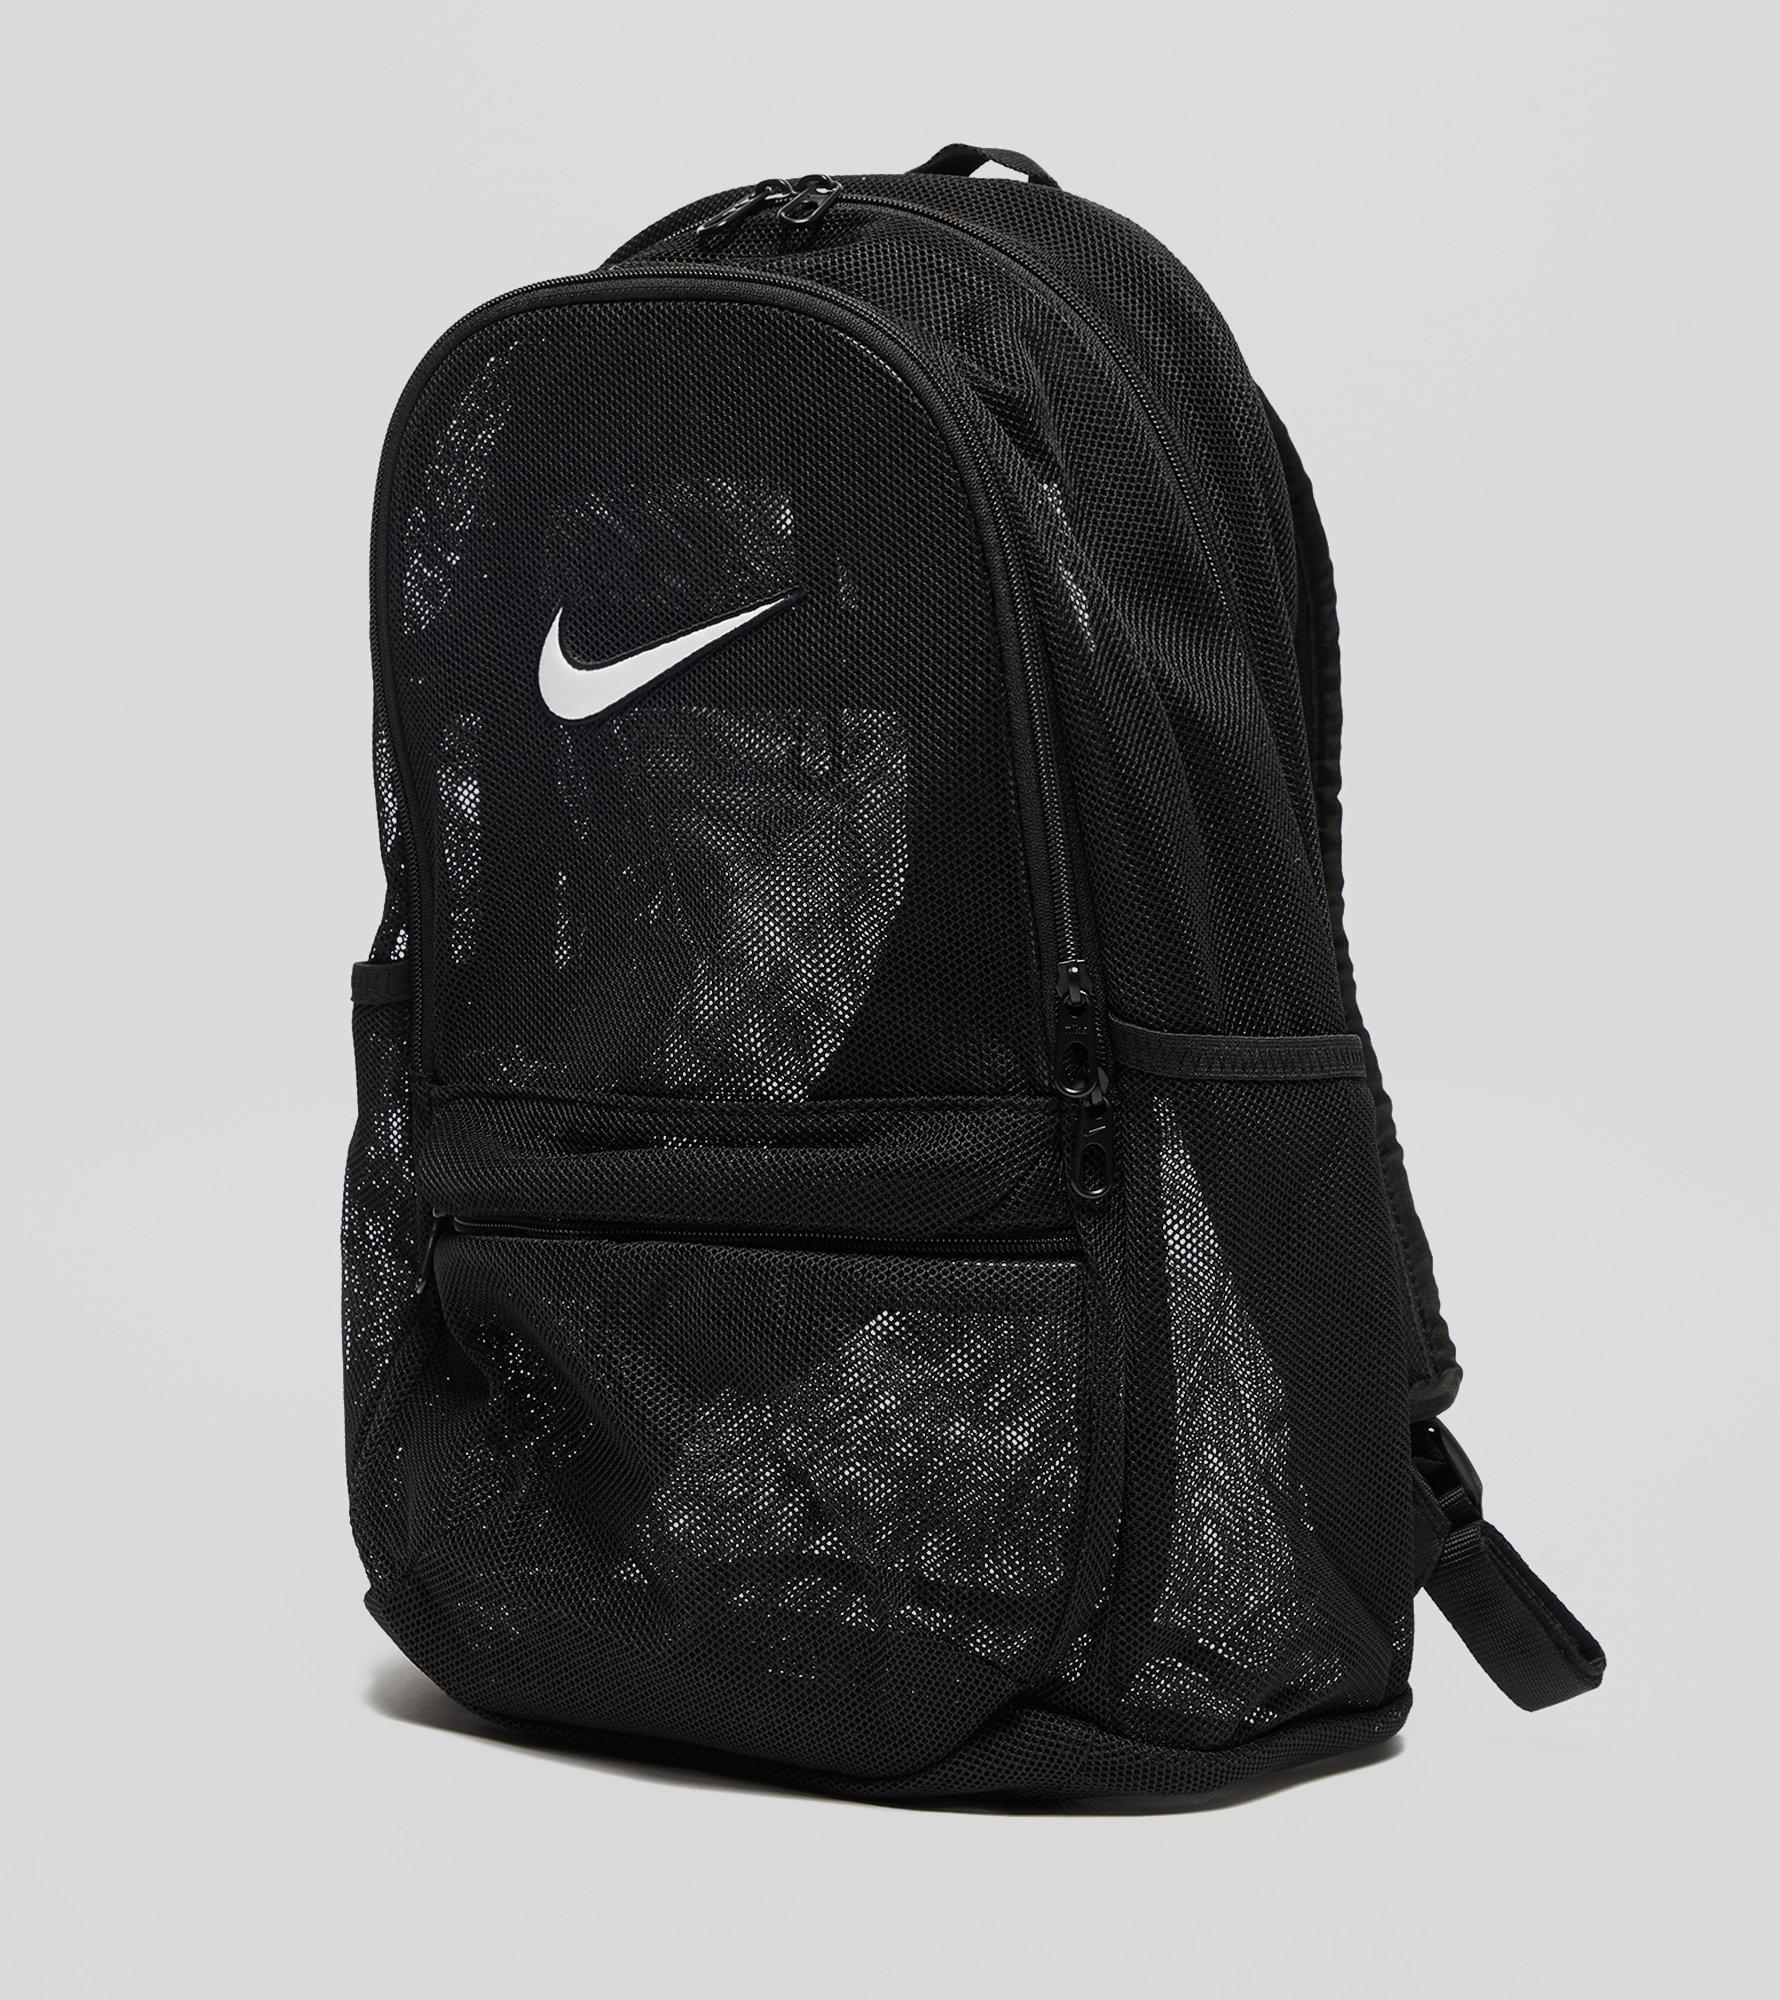 White Mesh Nike Backpack- Fenix Toulouse Handball